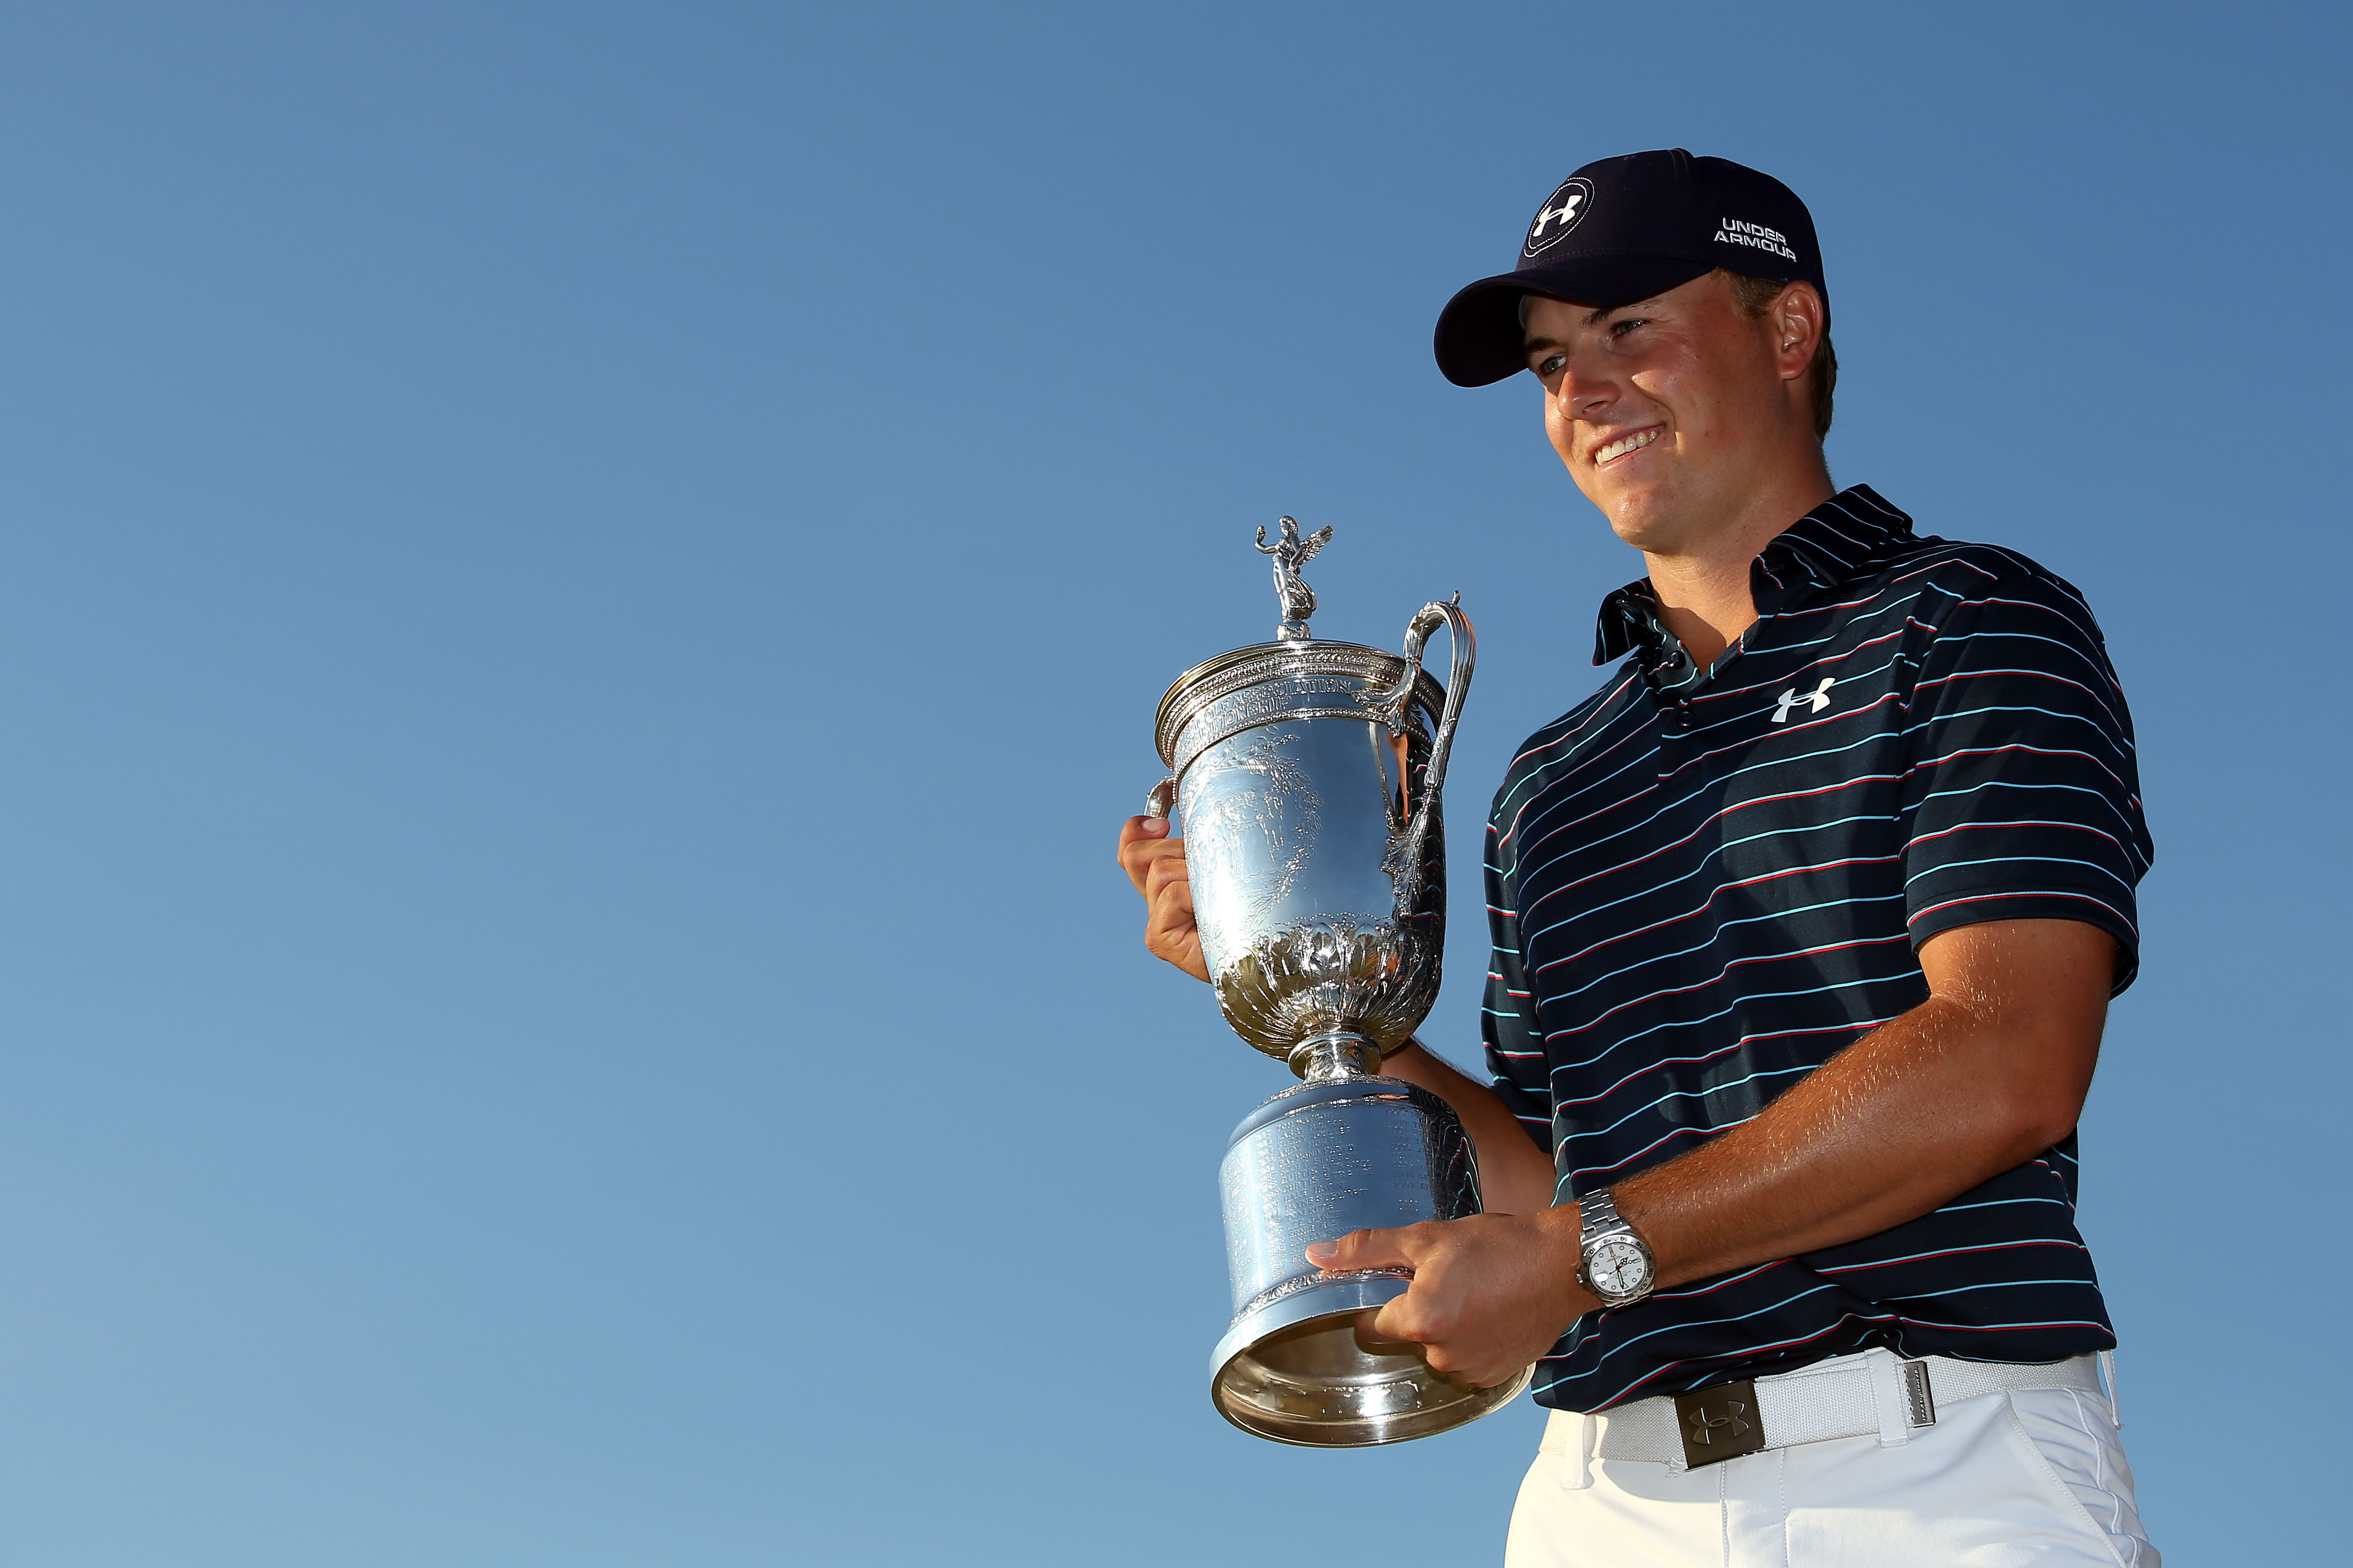 2. Jordan Spieth wins the U.S. Open